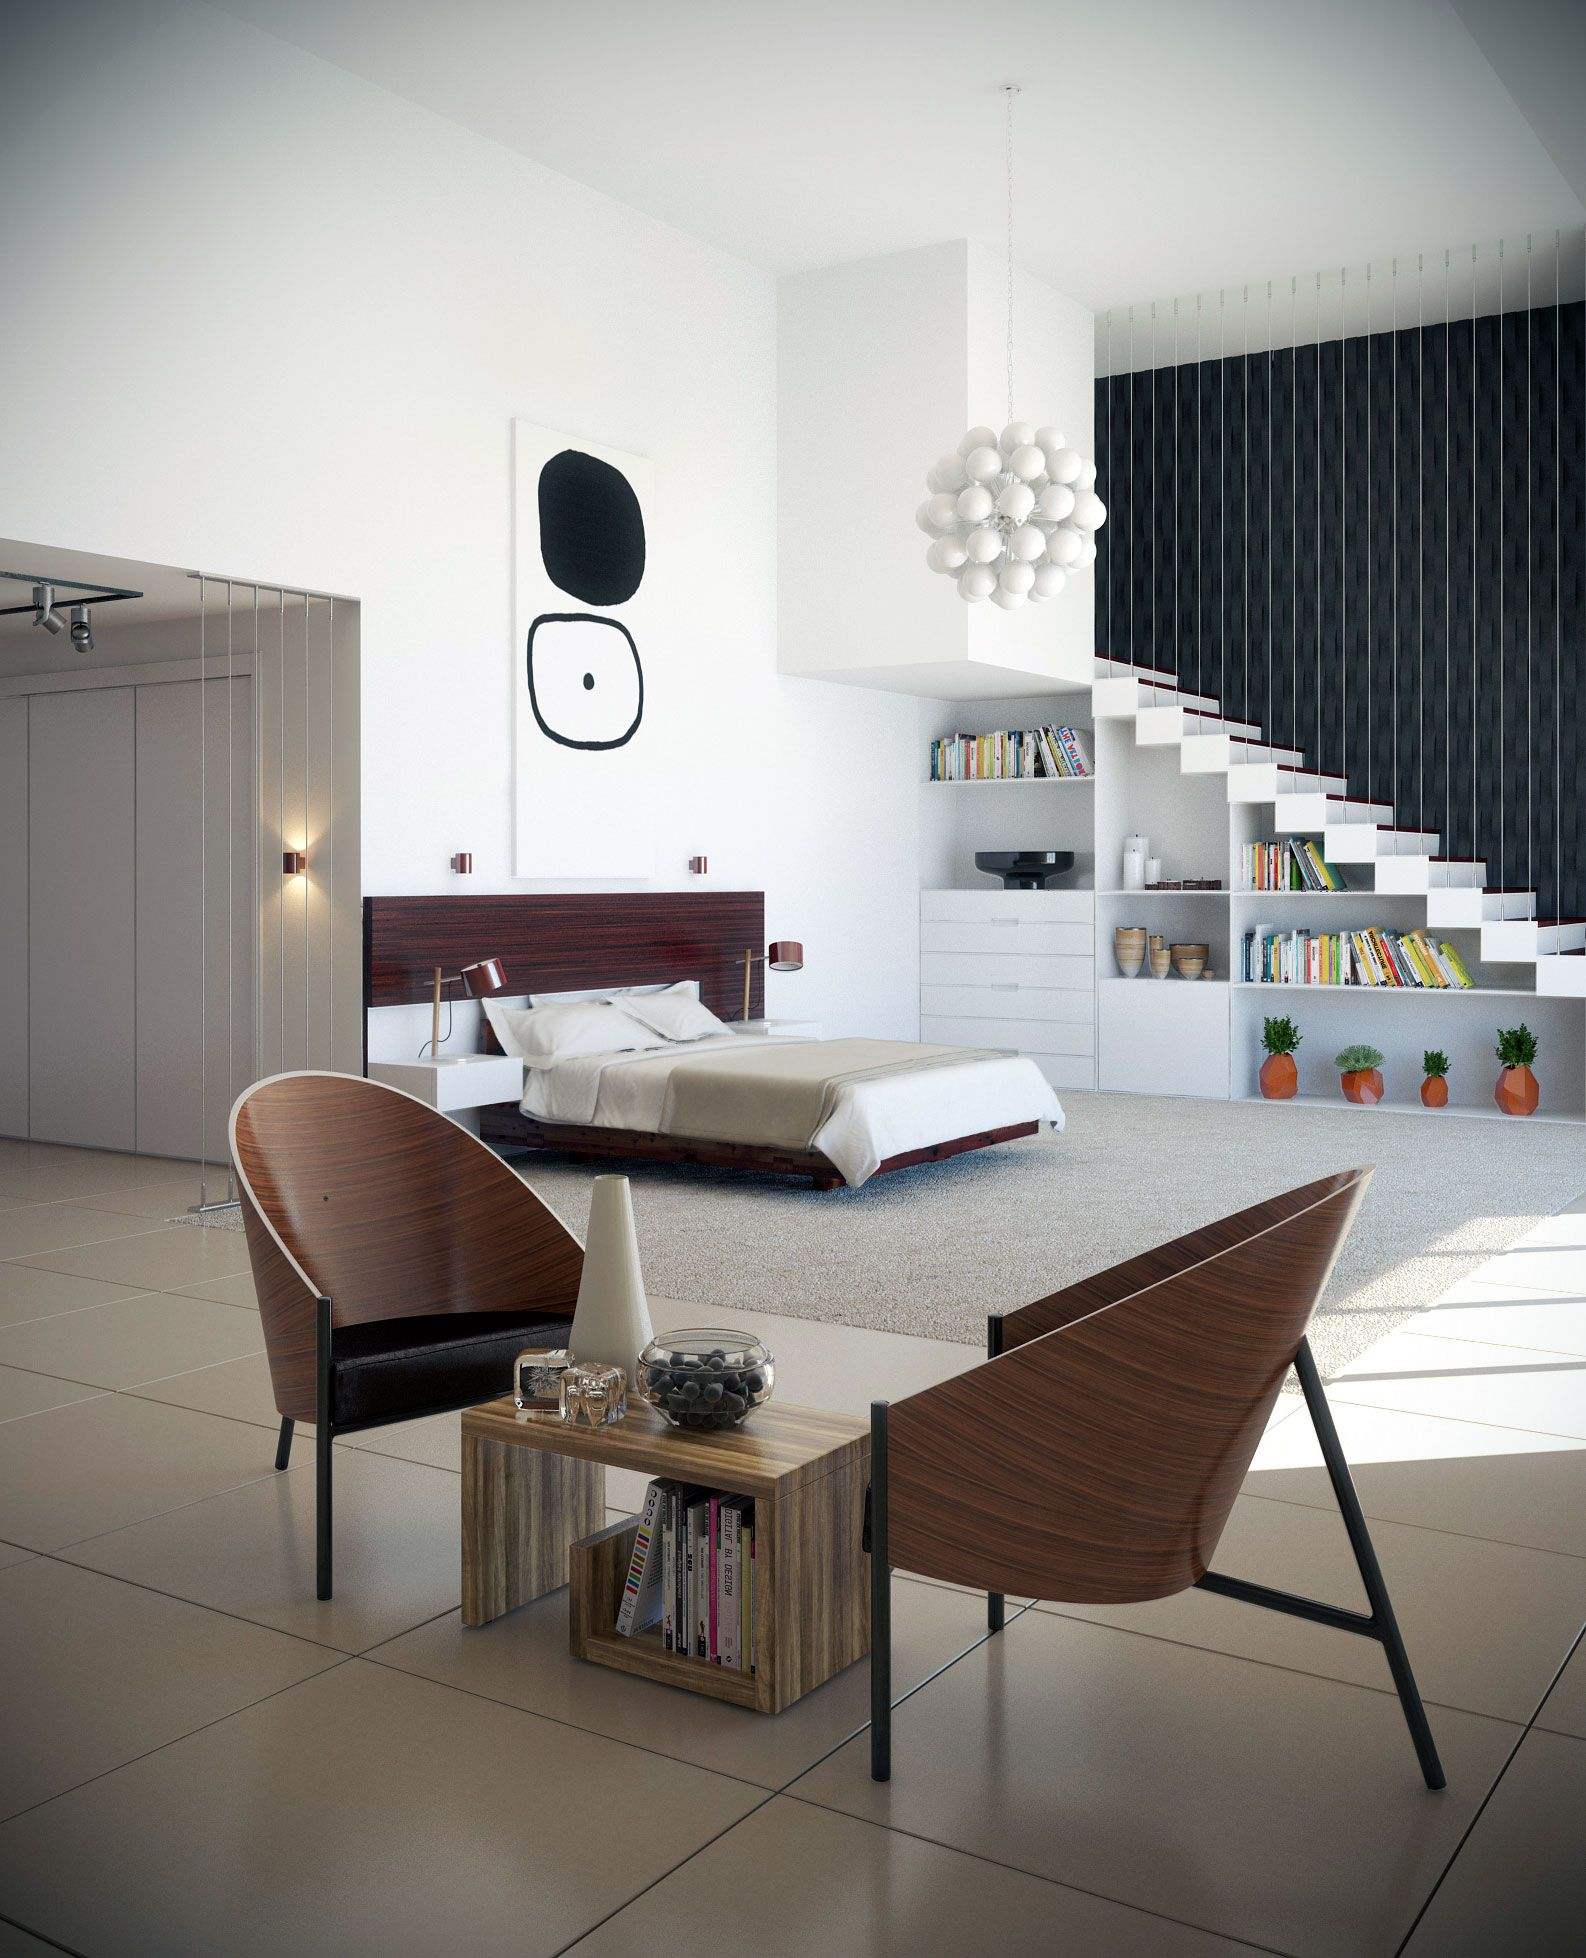 20 Modern Interior Bedroom Ideas For Scandinavian Style In 2020 Bedroom Interior Modern Interior Modern Scandinavian Interior